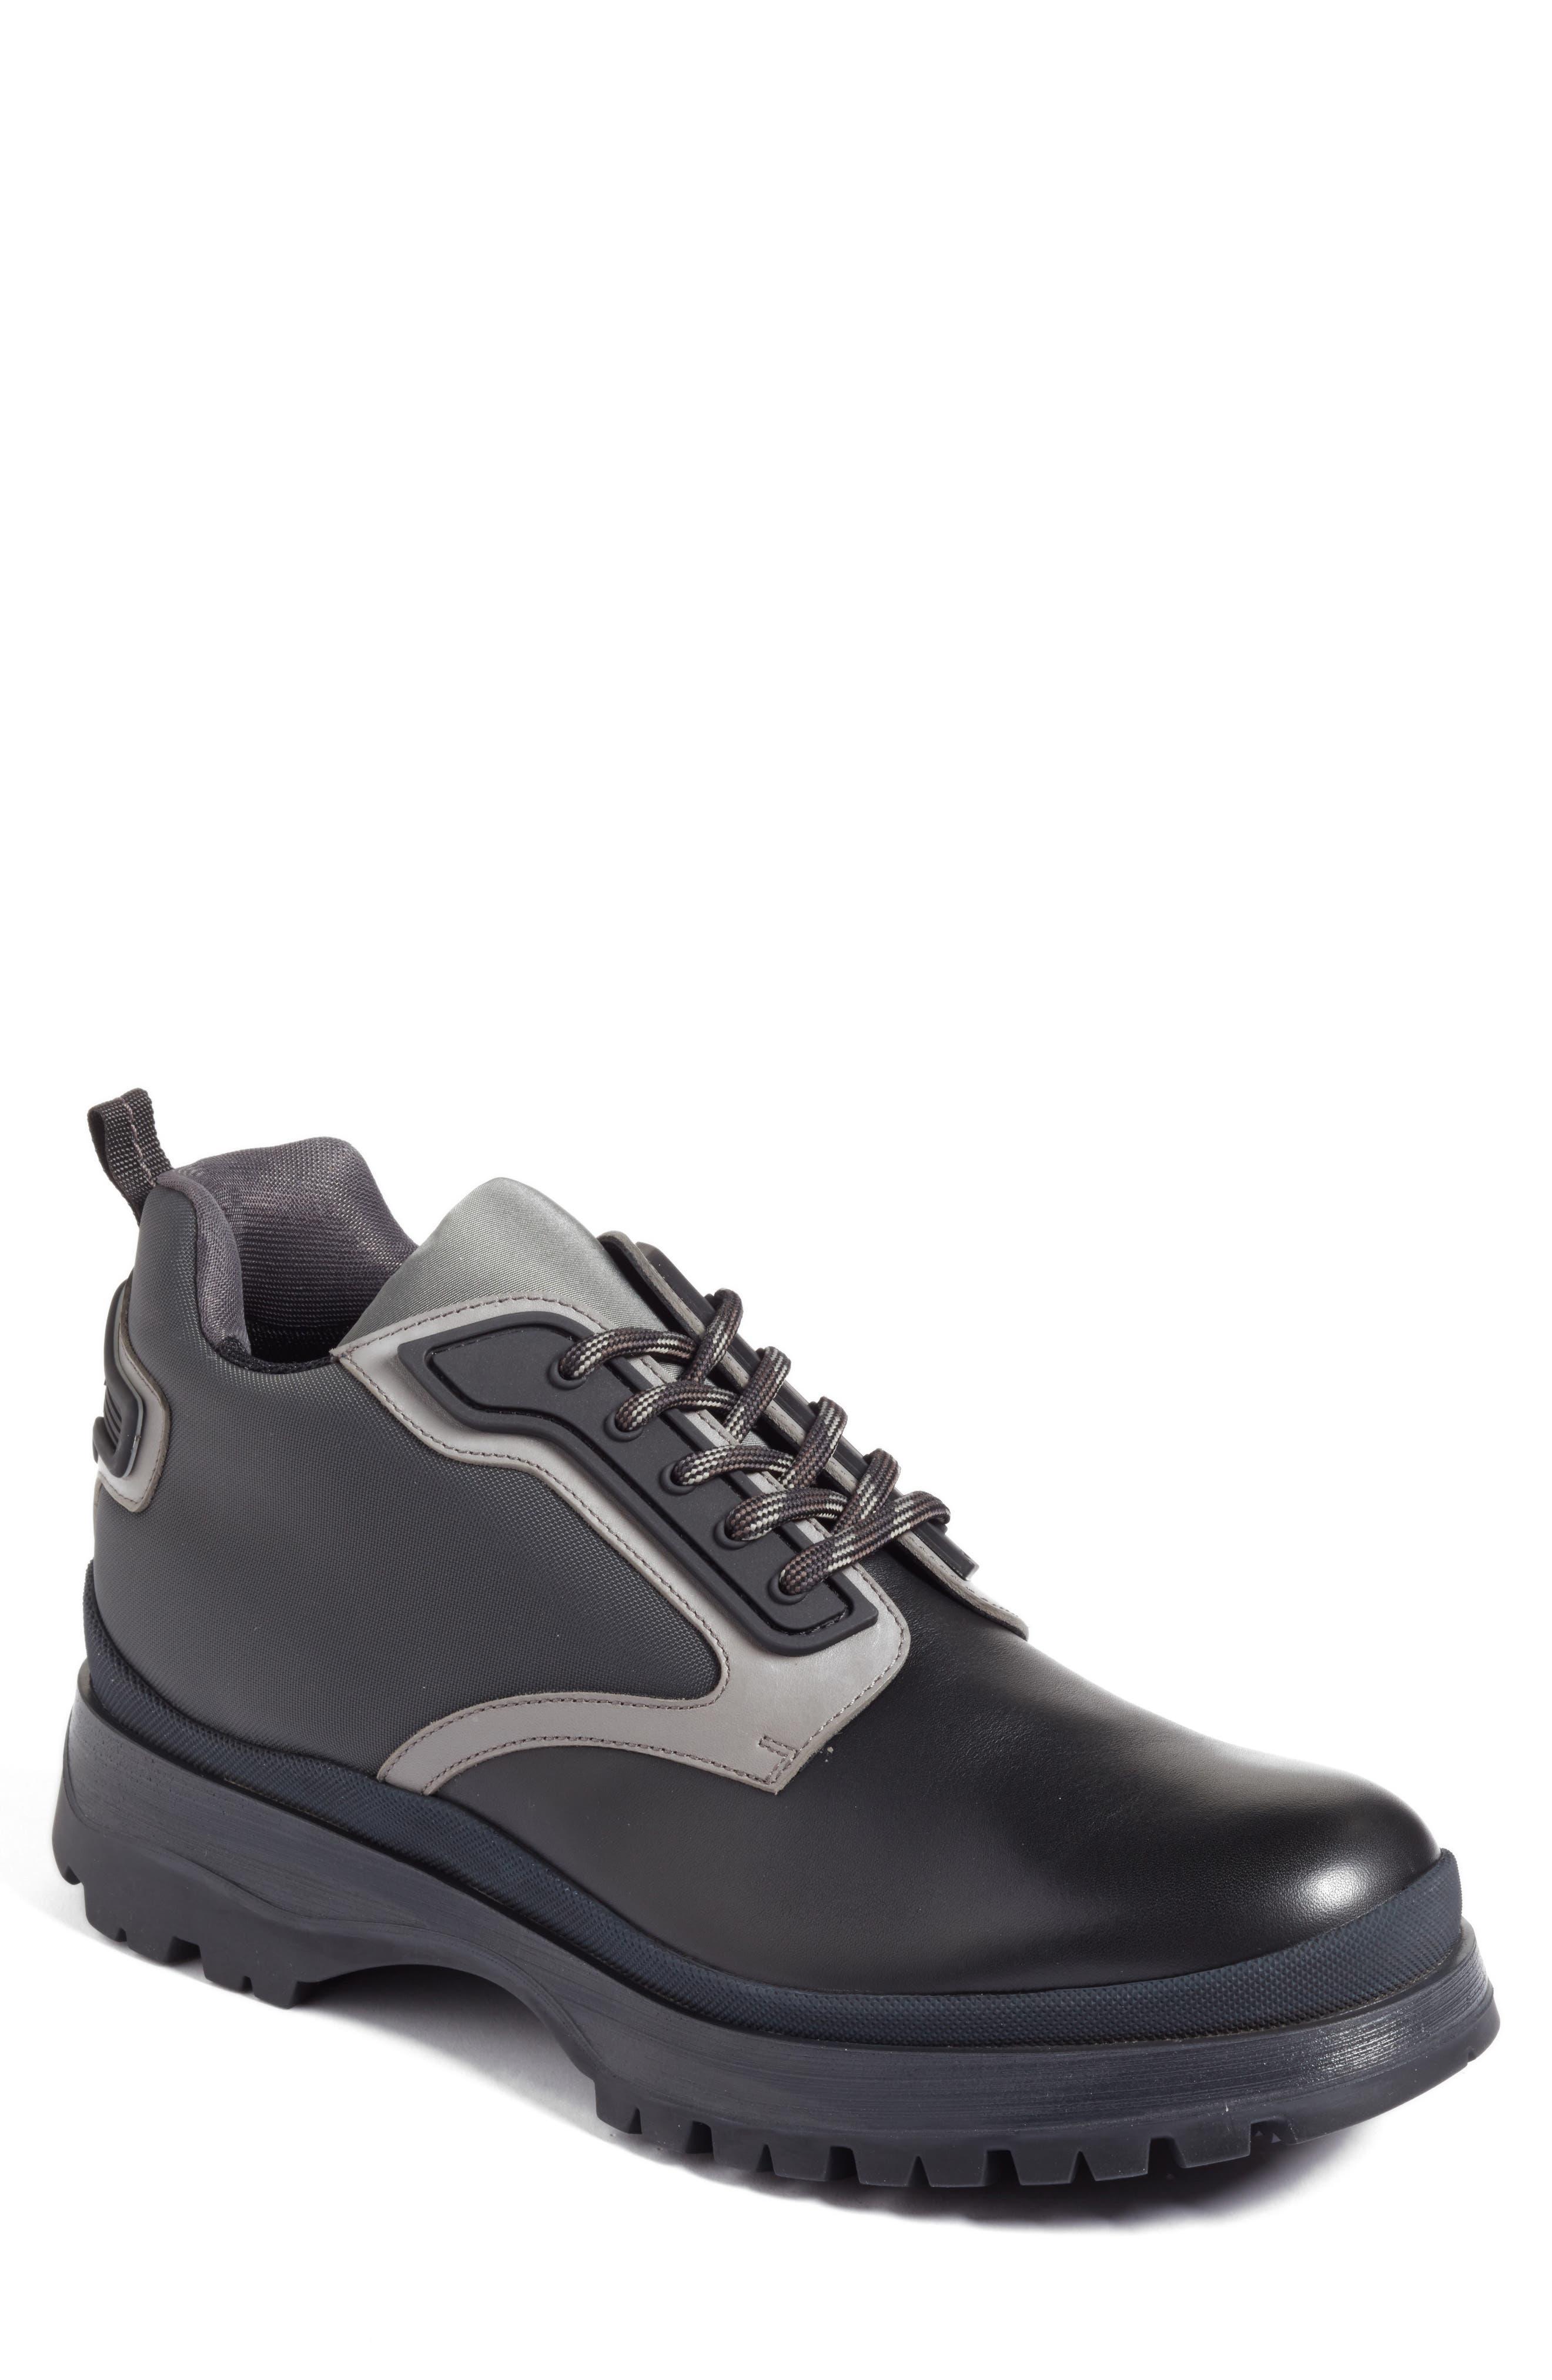 Tech Sneaker Boot,                             Main thumbnail 1, color,                             007